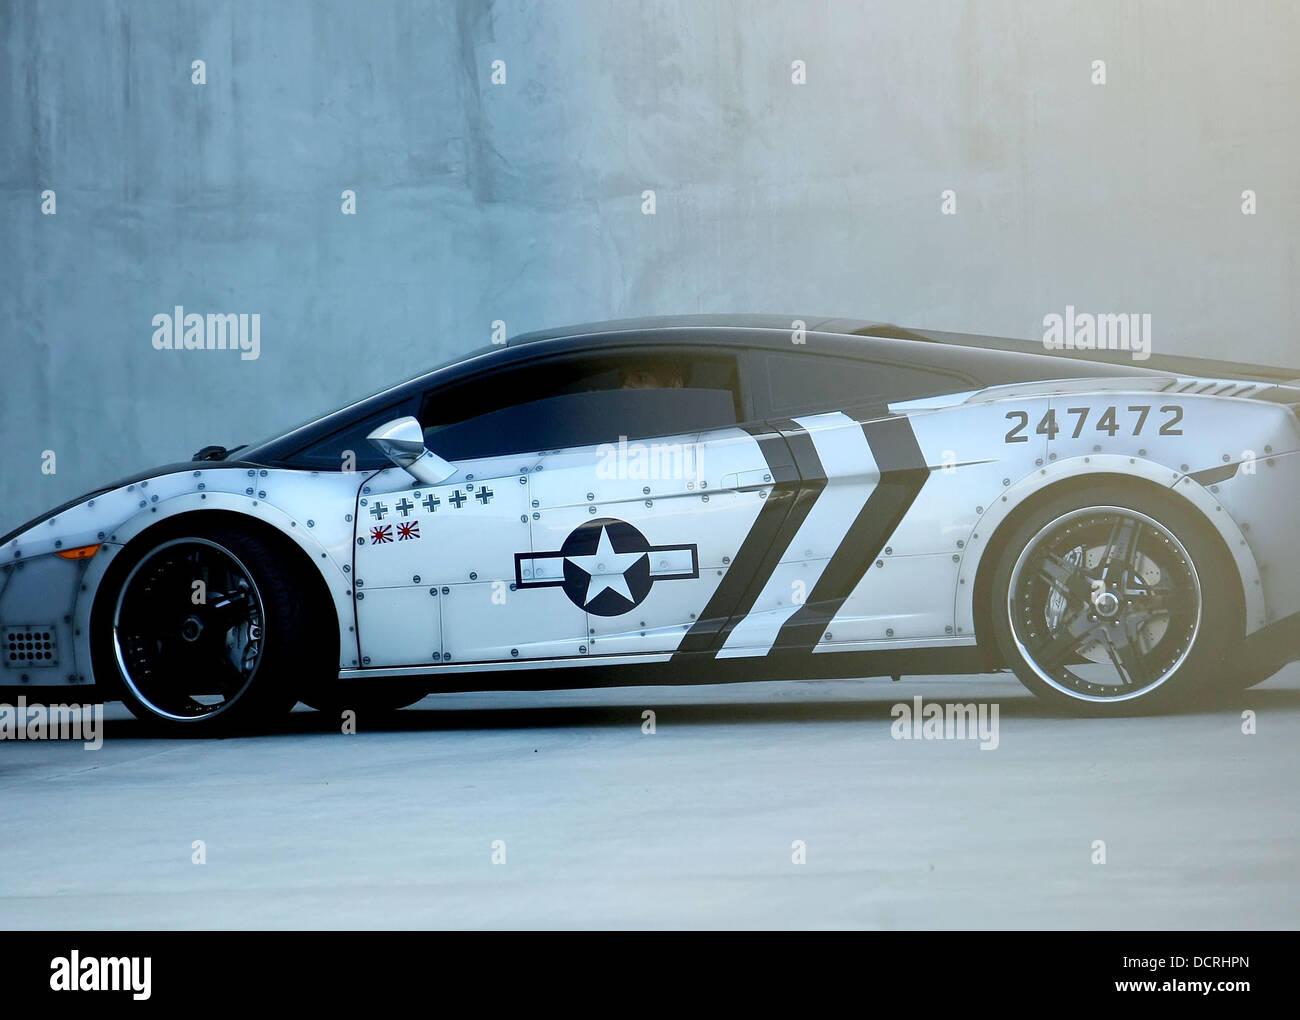 Chris Brown Waits In His Customized Lamborghini Gallardo For His